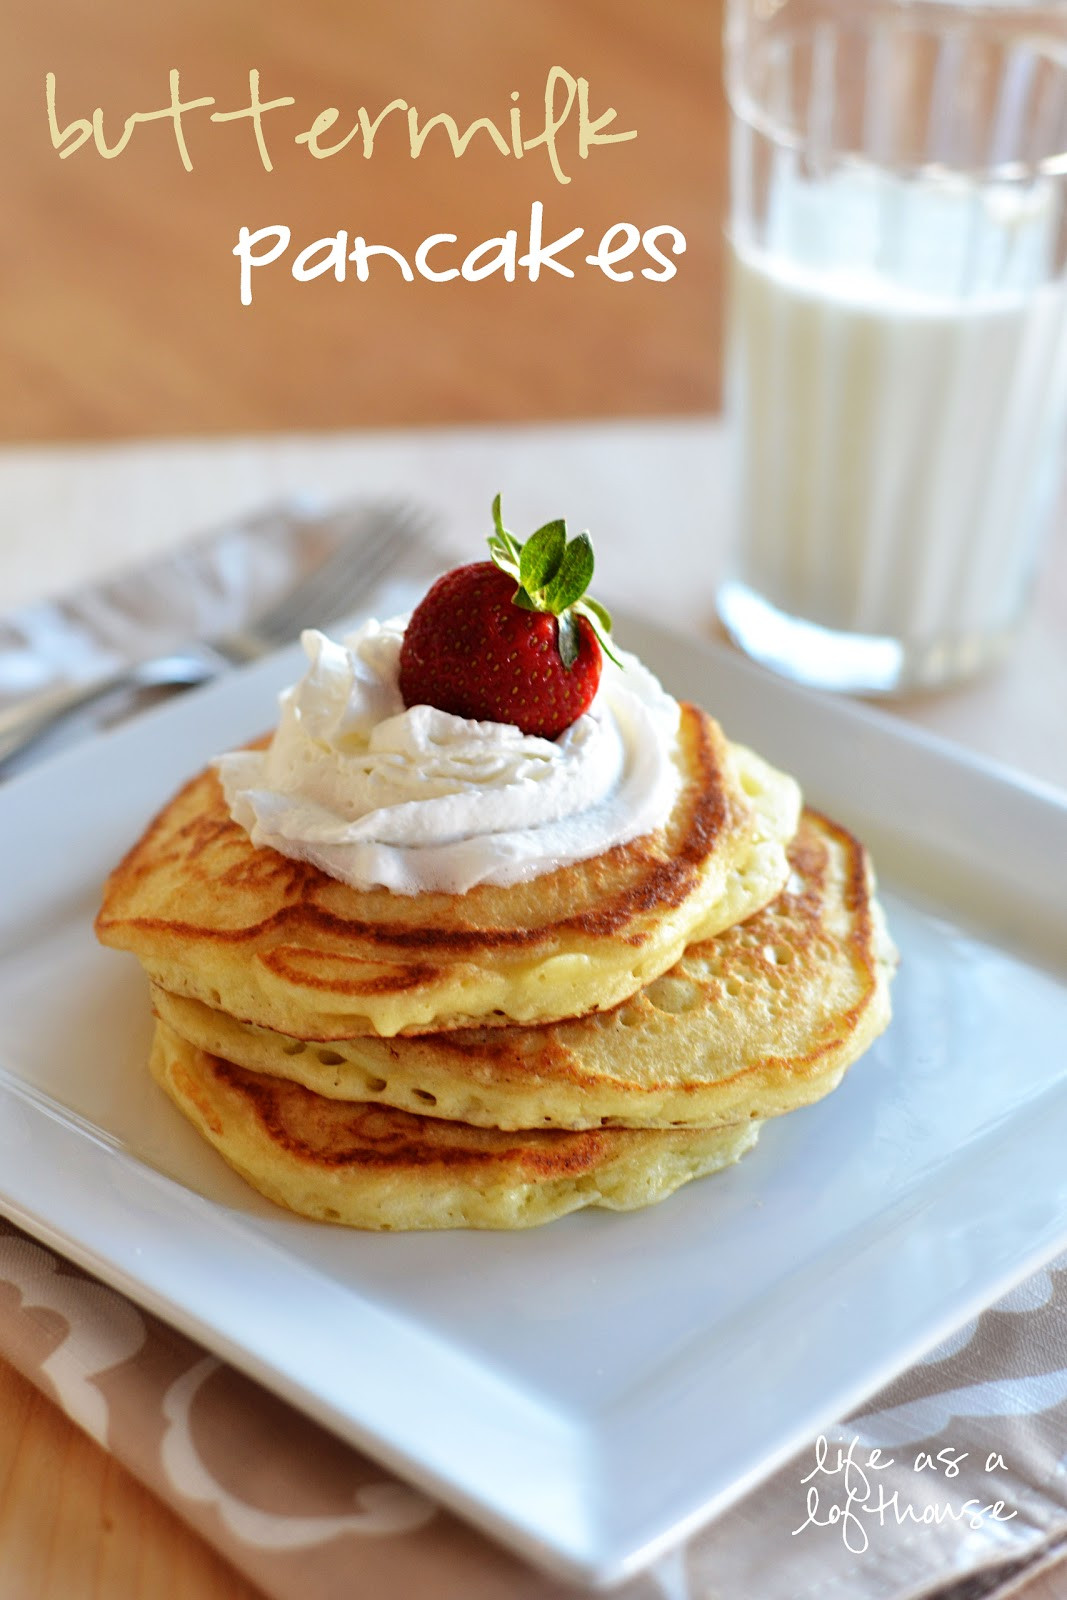 Bisquick Buttermilk Pancakes  Buttermilk Pancakes